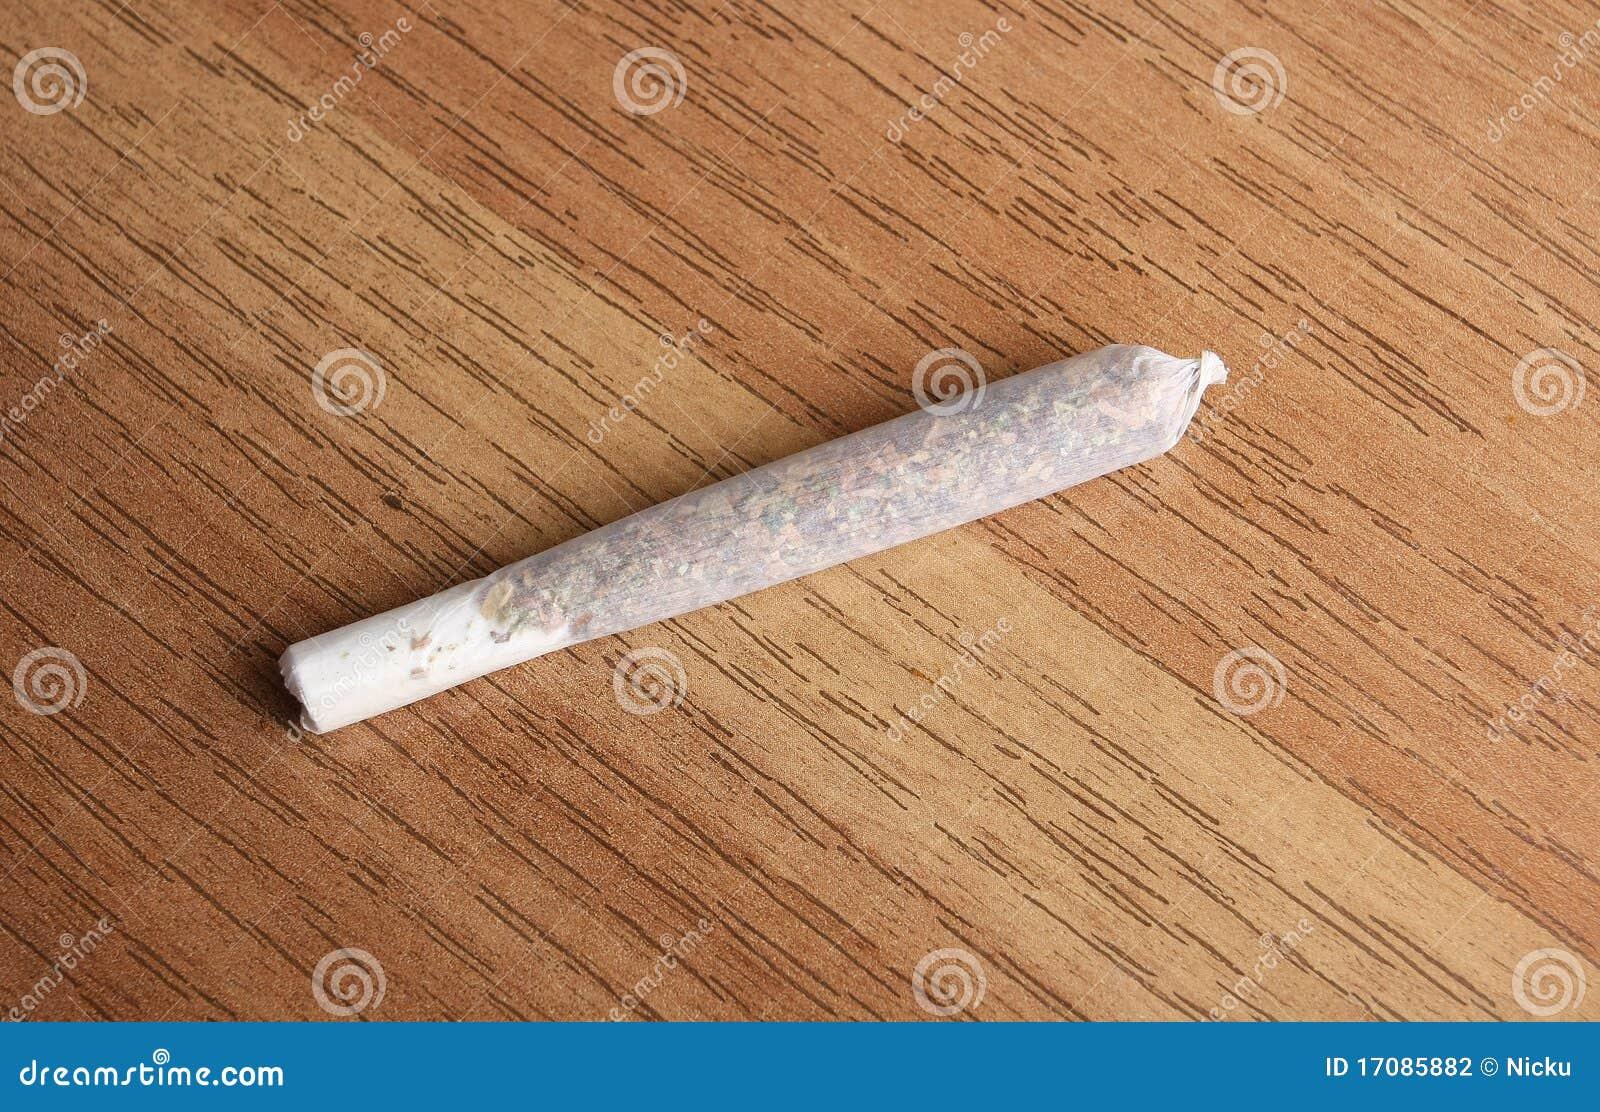 Сигарета марихуаны сорт конопли фото